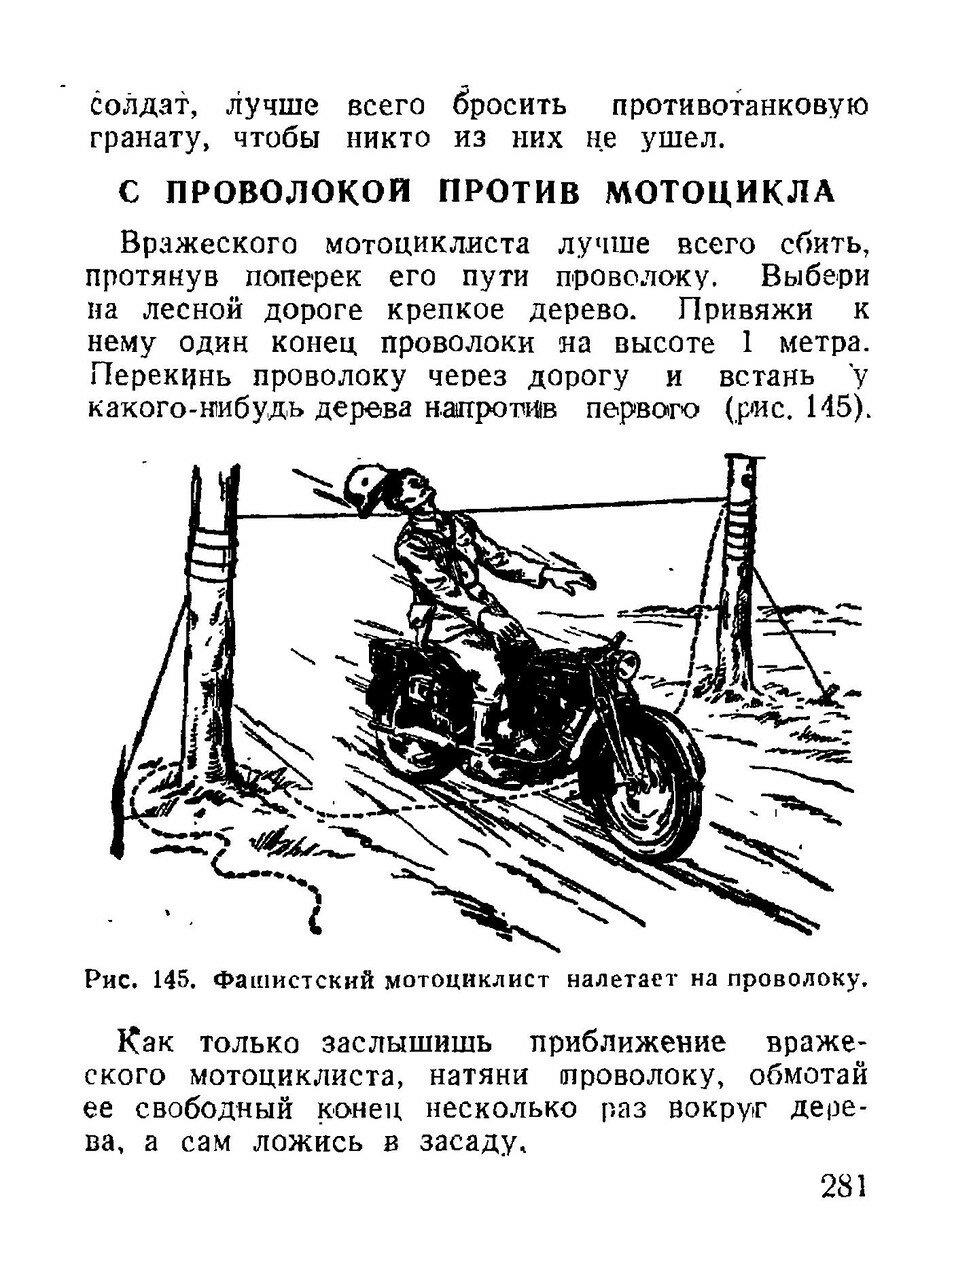 Юрий Вебер - Спутник партизана / Справочники / 1942 / PDF)